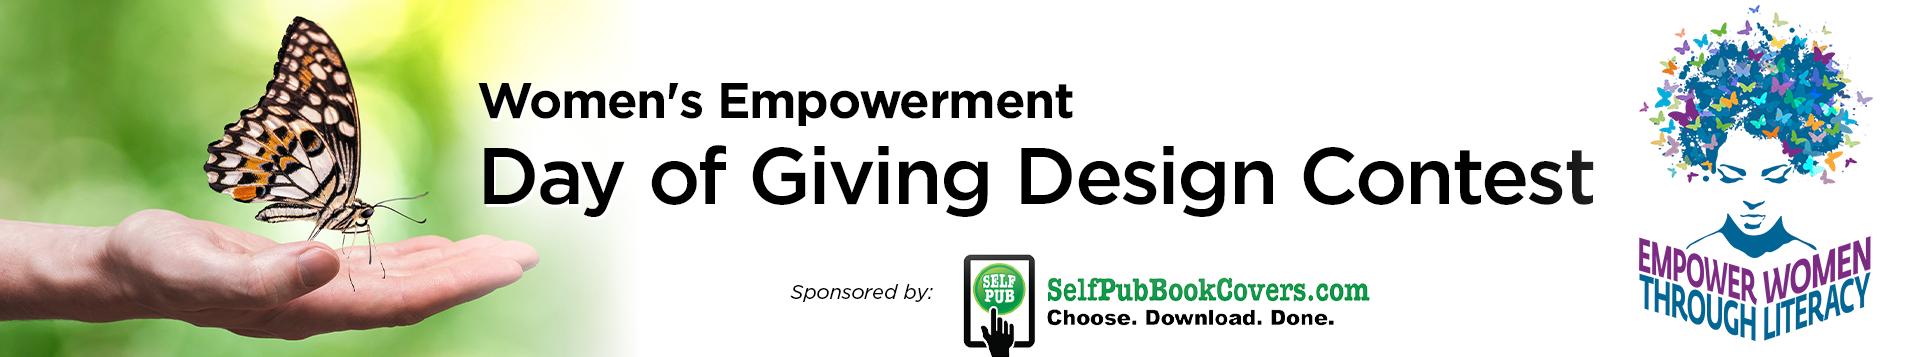 Women's Empowerment Banner